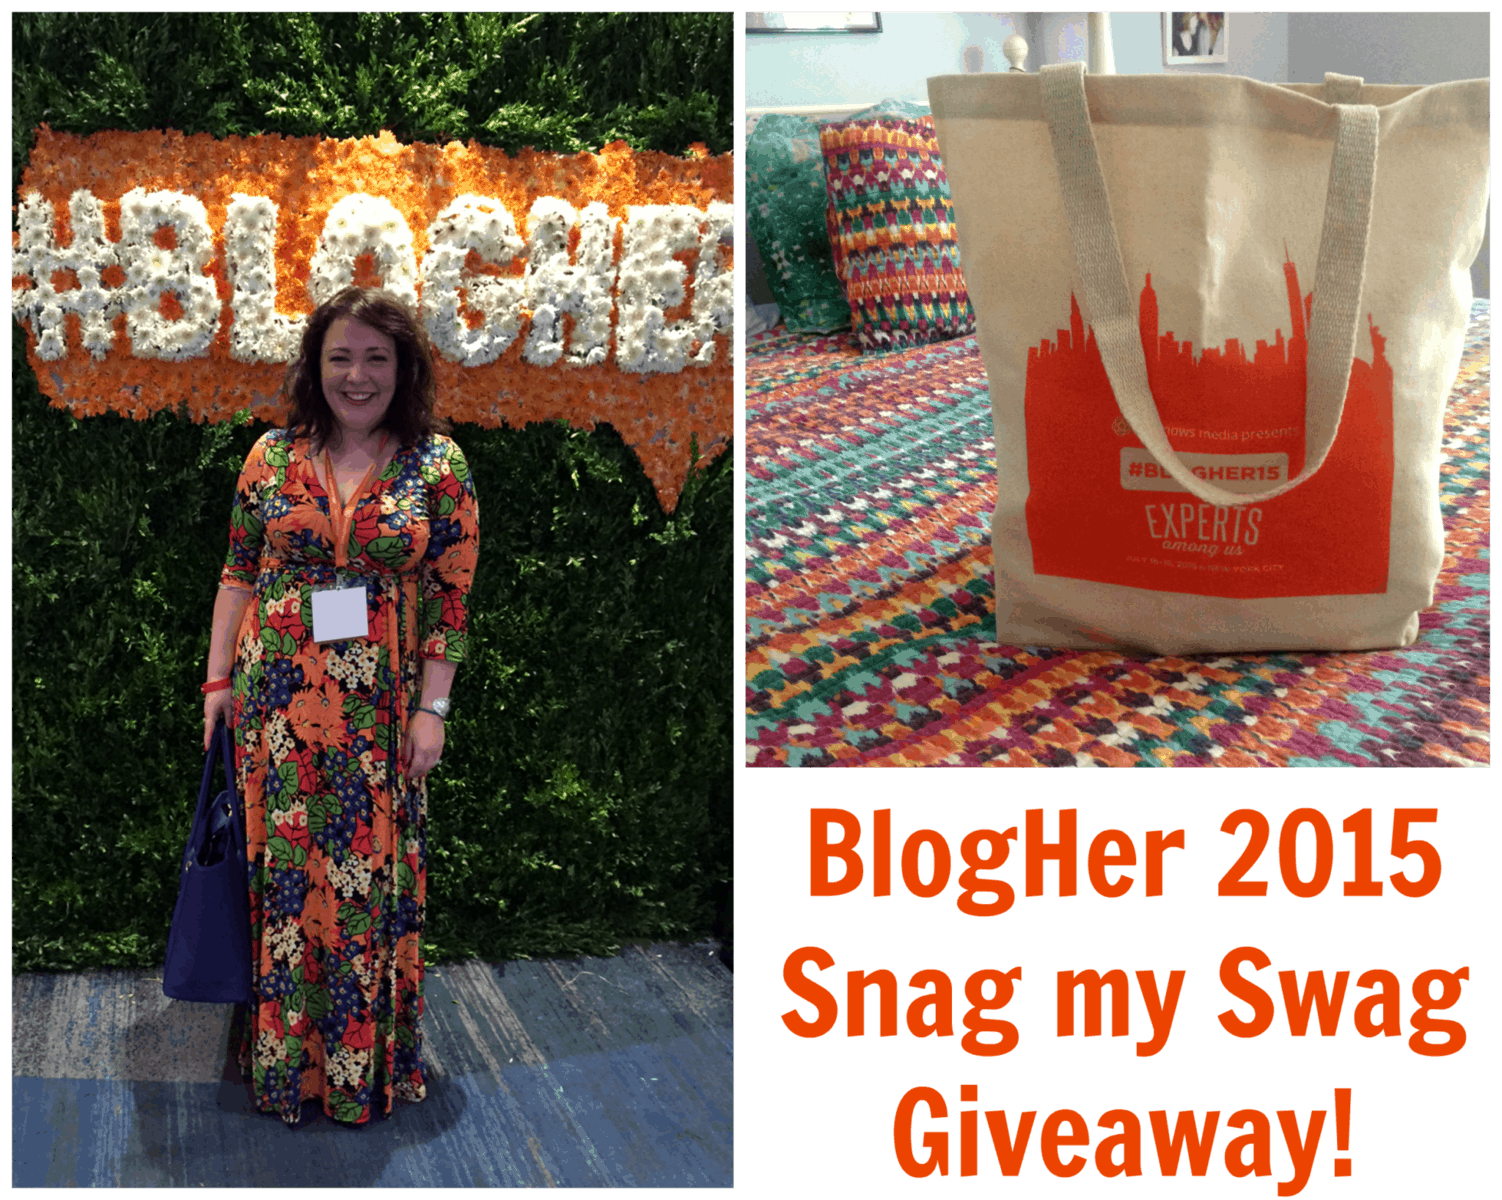 blogher2015 swag giveaway wardrobe oxygen